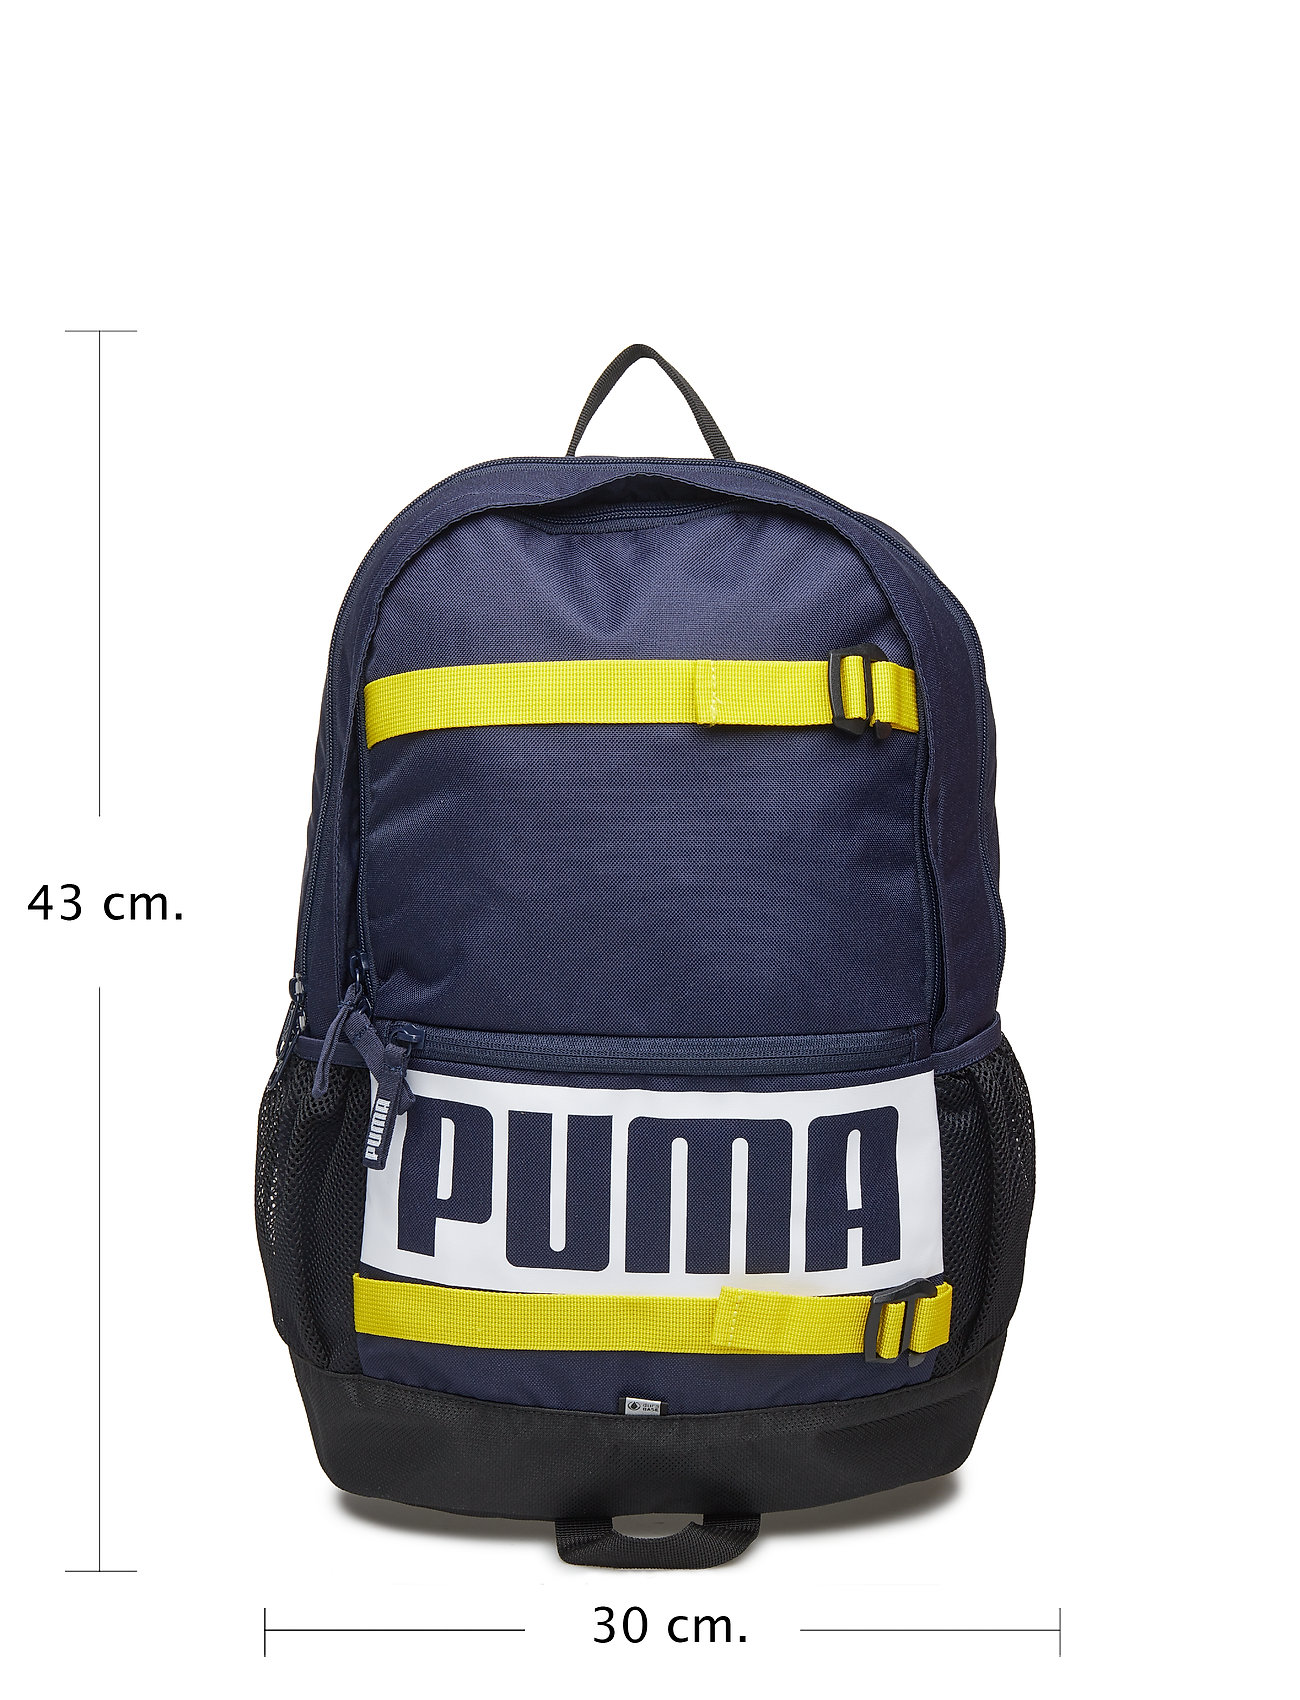 Deck Puma Deck Puma Deck Backpackpeacoat Puma Backpackpeacoat Puma Backpackpeacoat kXPTOZiu